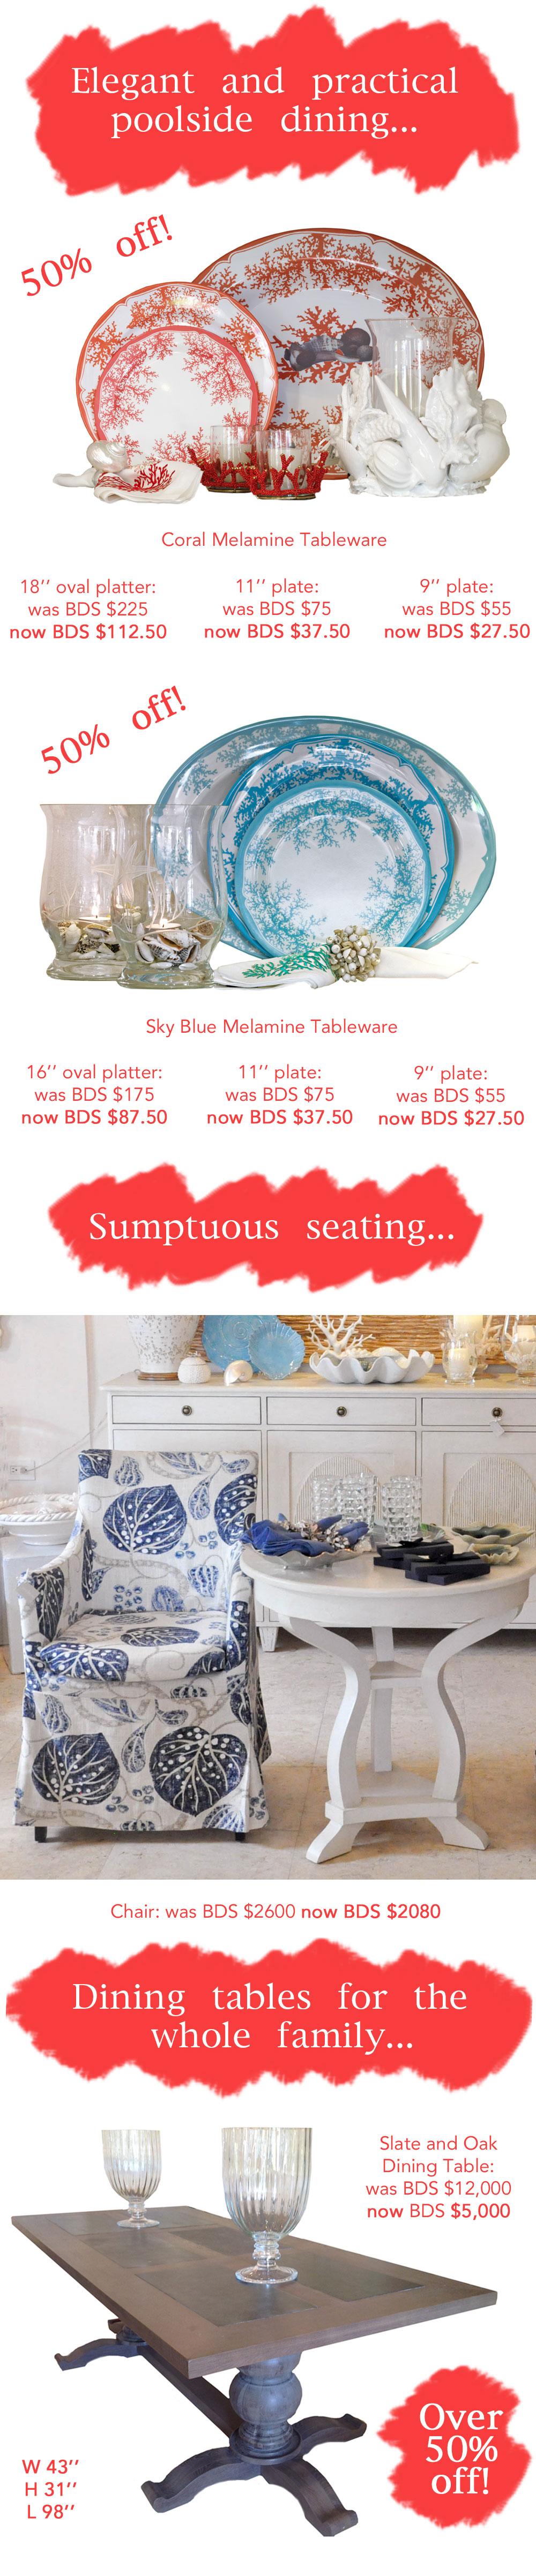 Jenny Blanc Blog - Barbados summer sale part 2